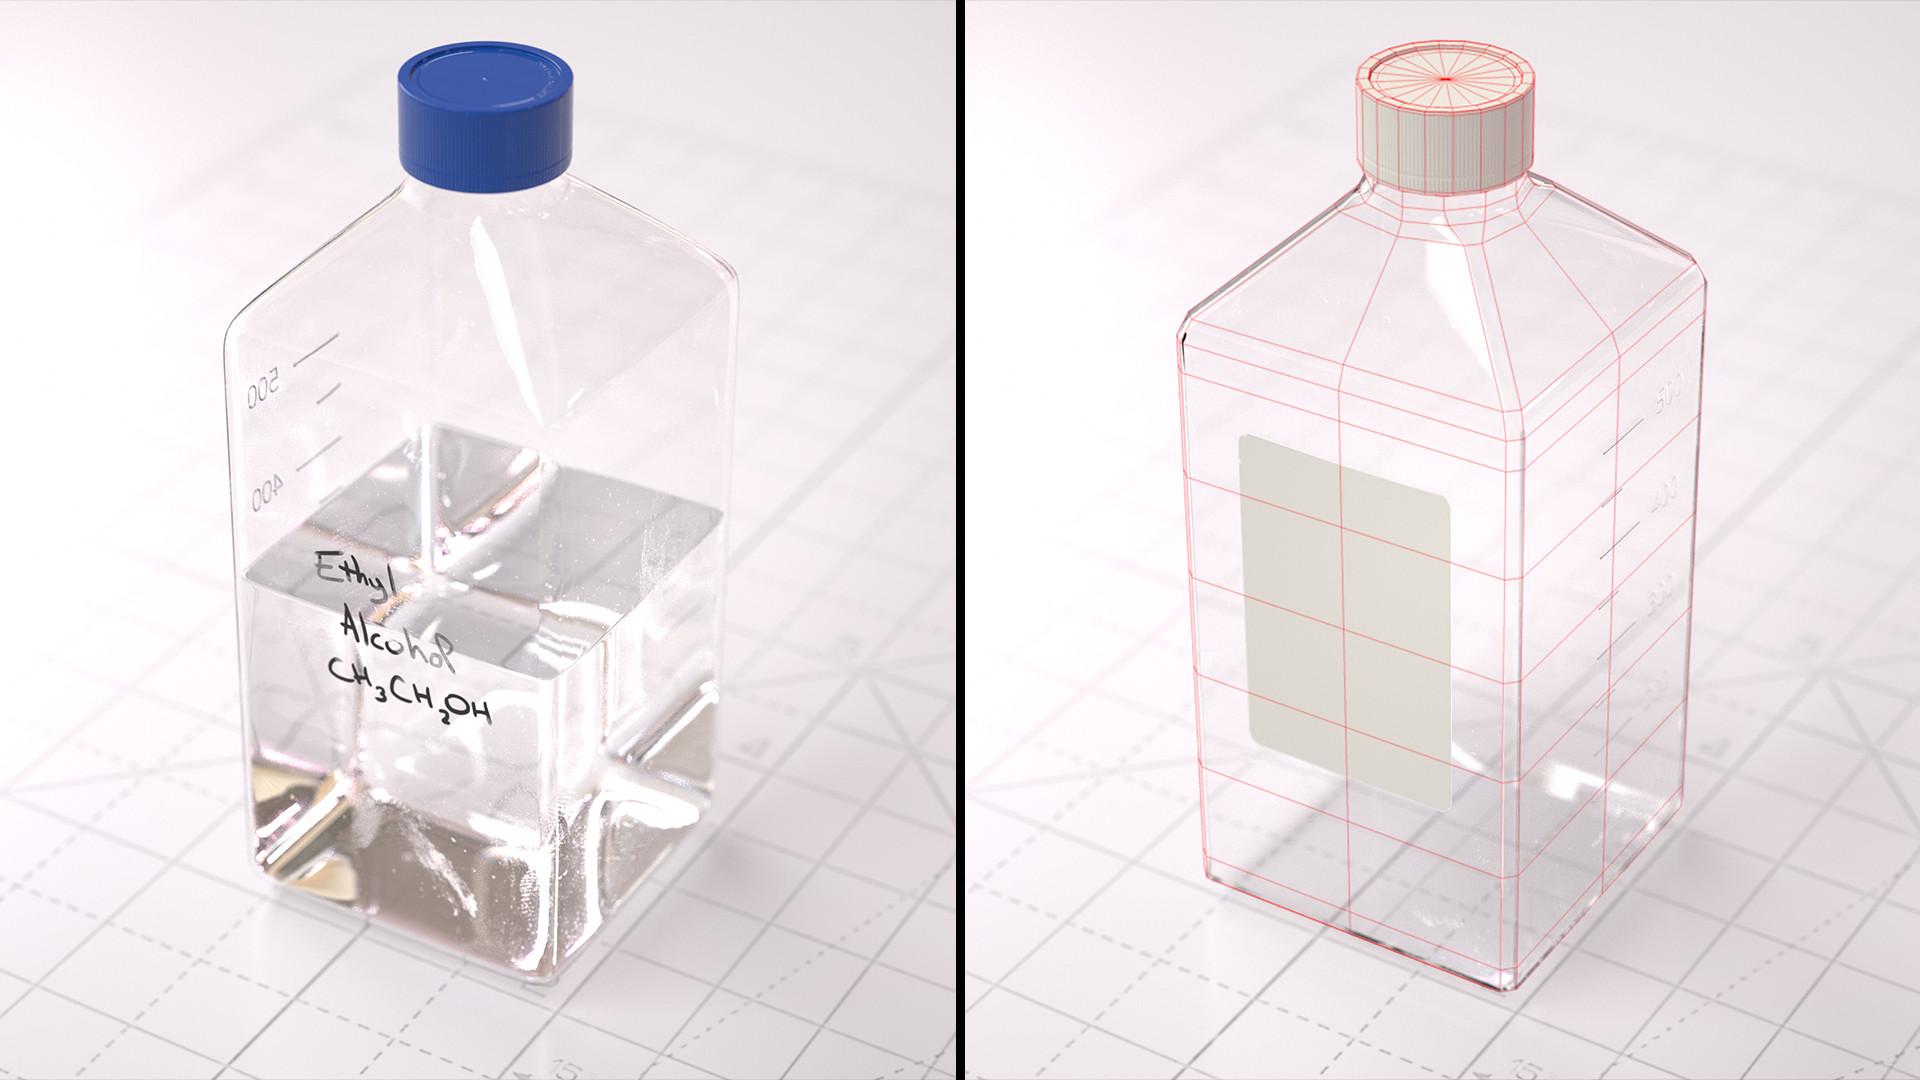 Basile arquis magicbulb laboratory square bottle 13